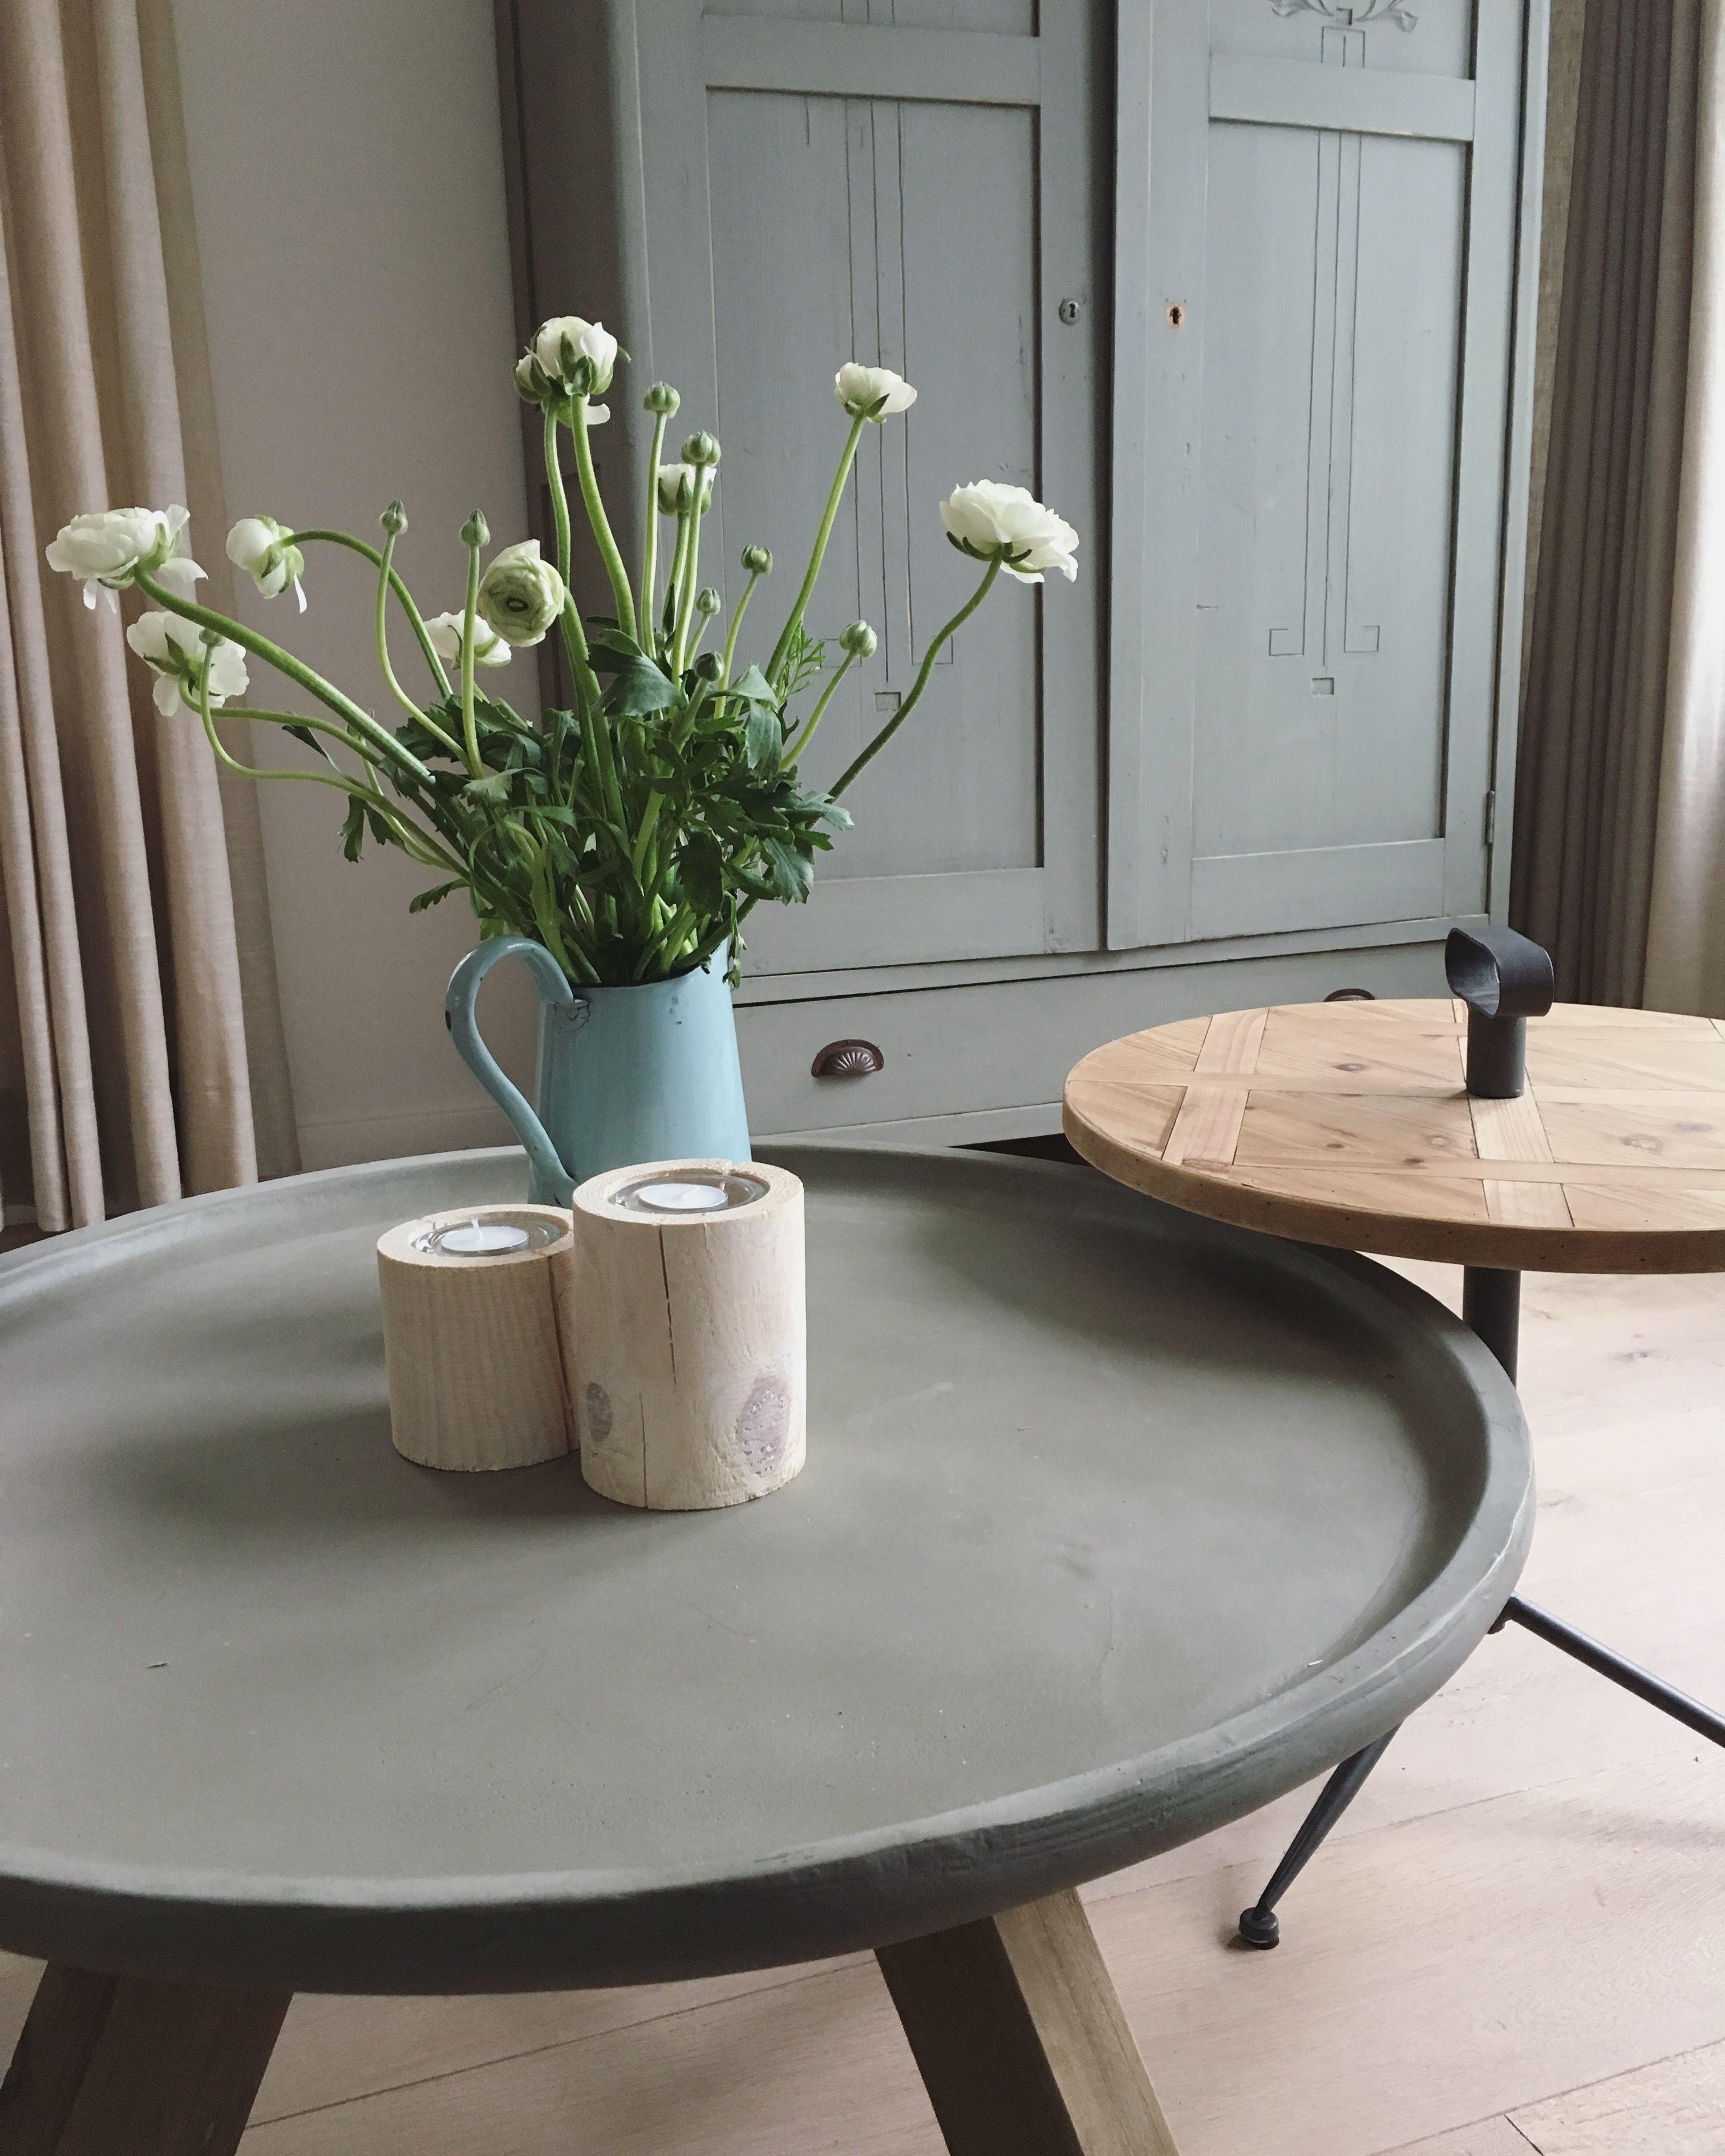 Ronde salontafel bijzettafel scandinavisch interieur for Salontafel rond design